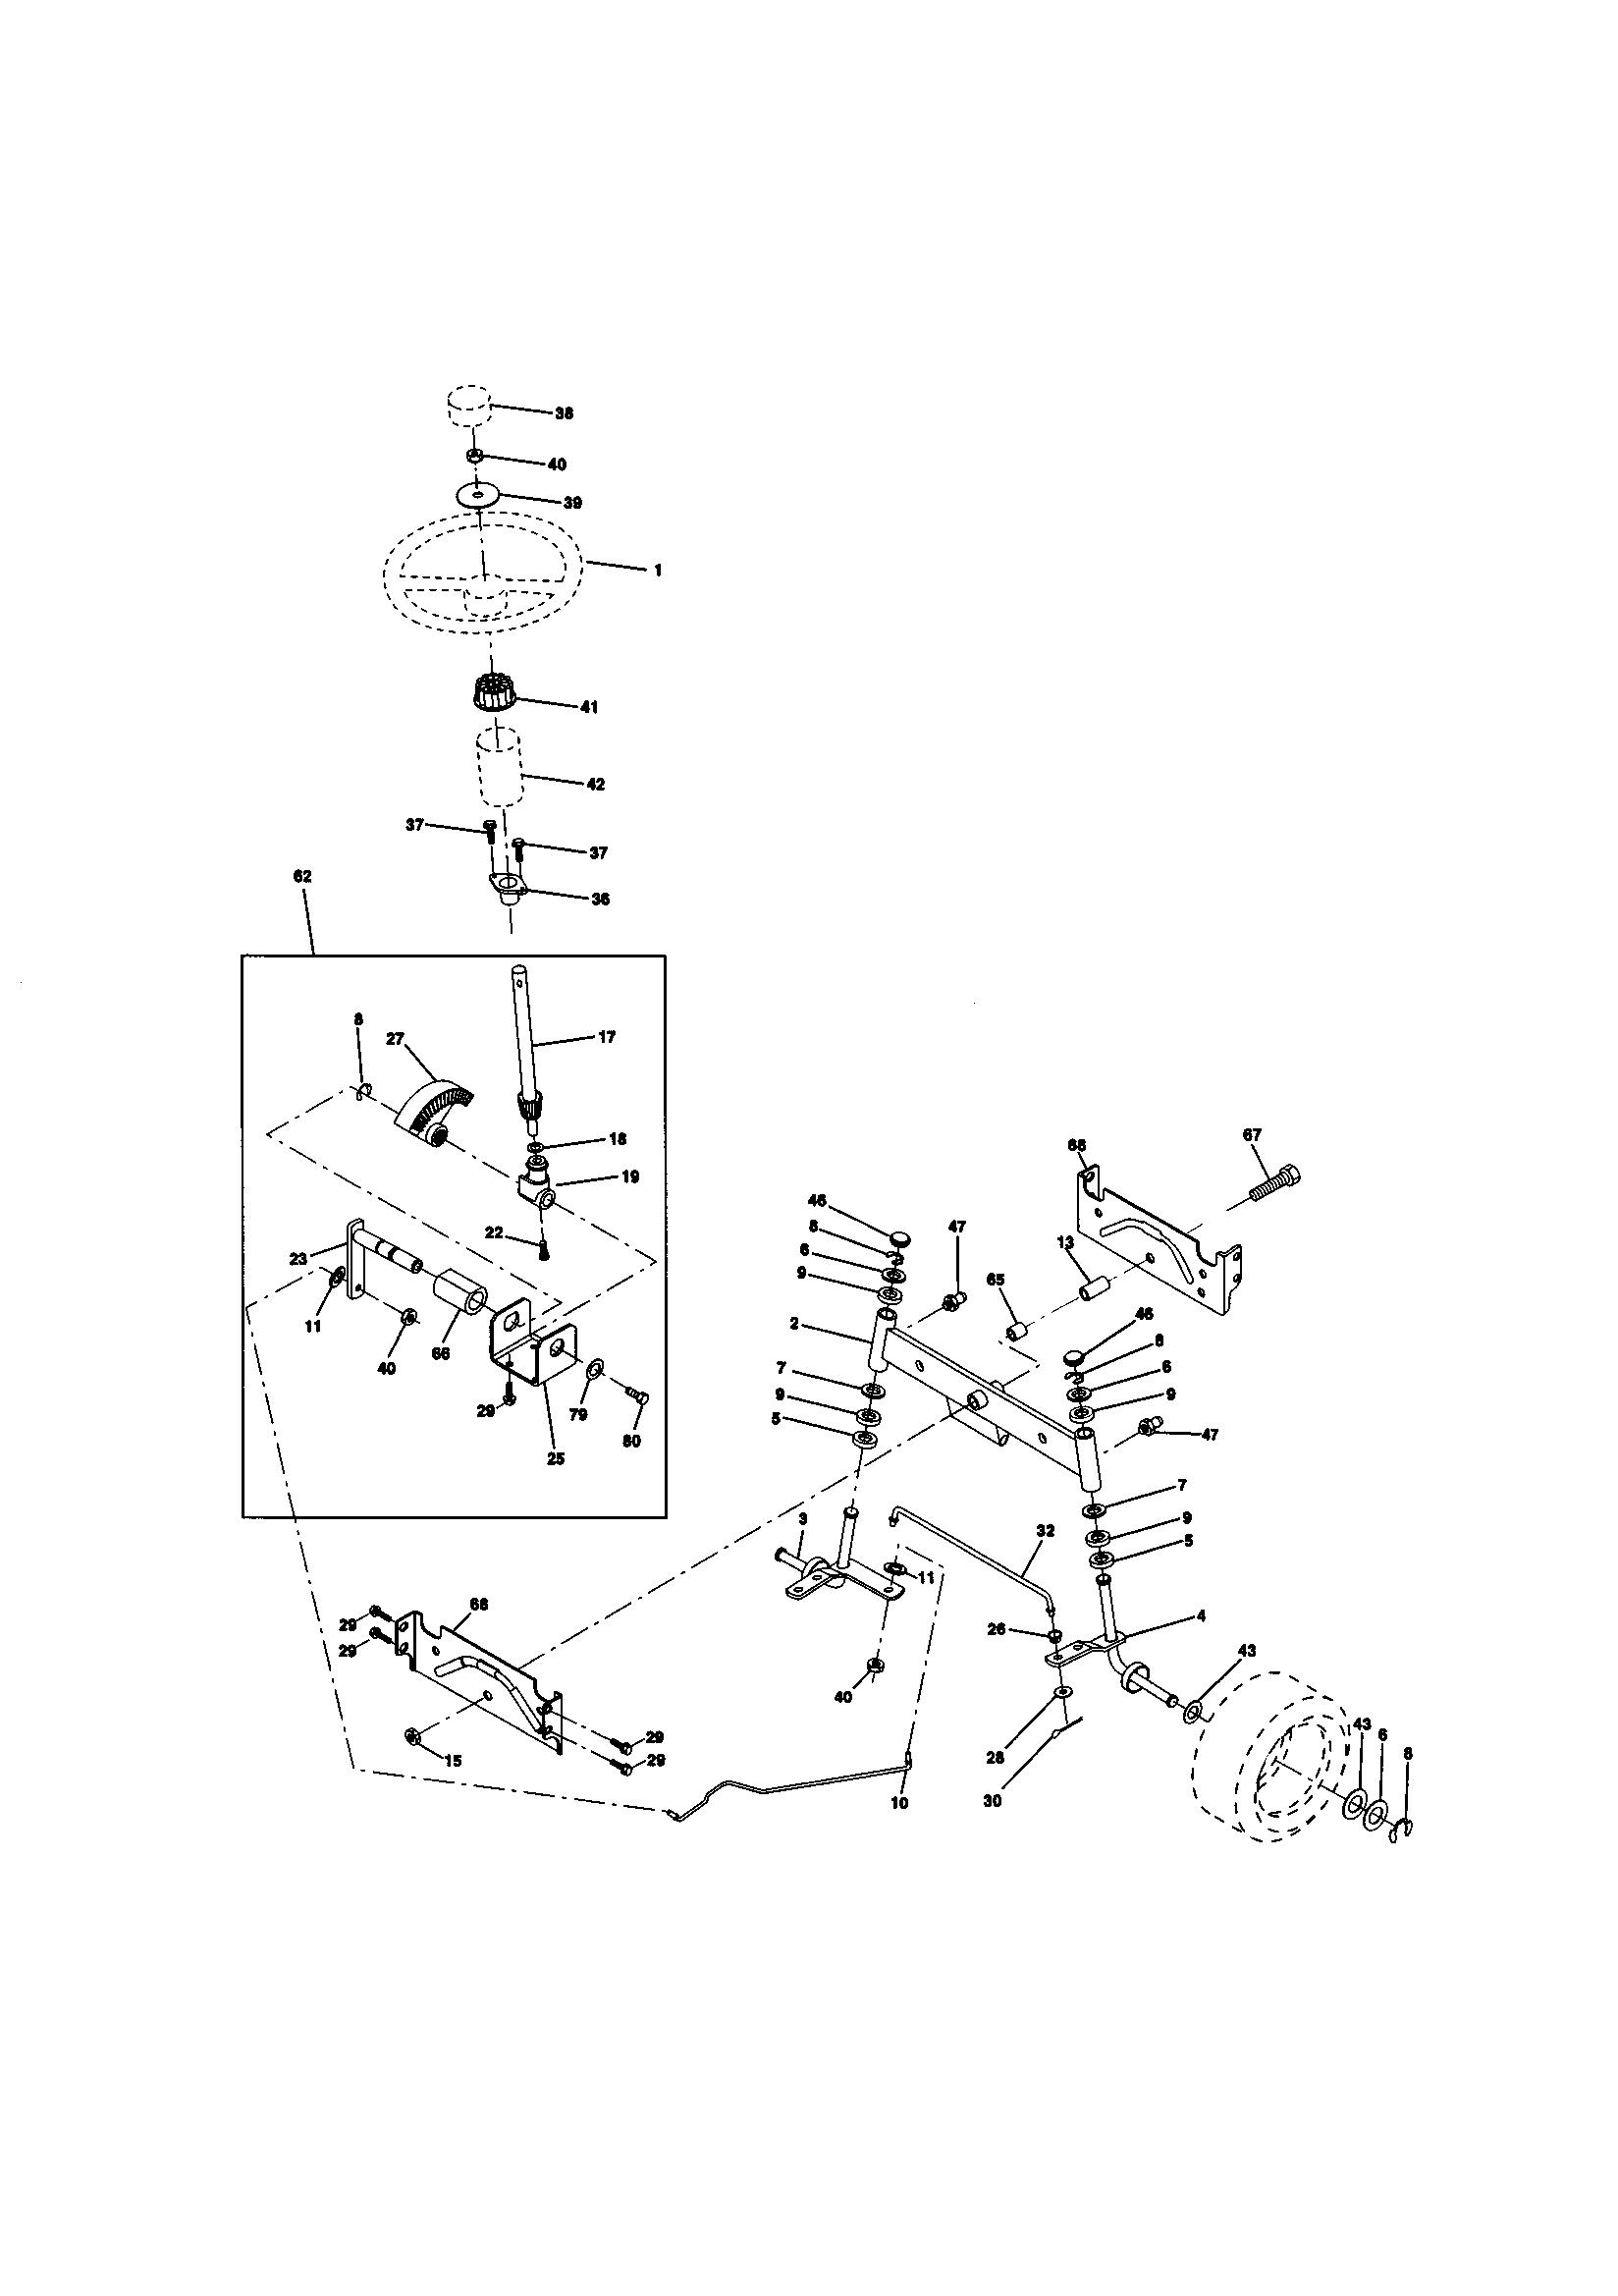 [WRG-1669] Fs5500 Craftsman Tractor Wiring Diagram